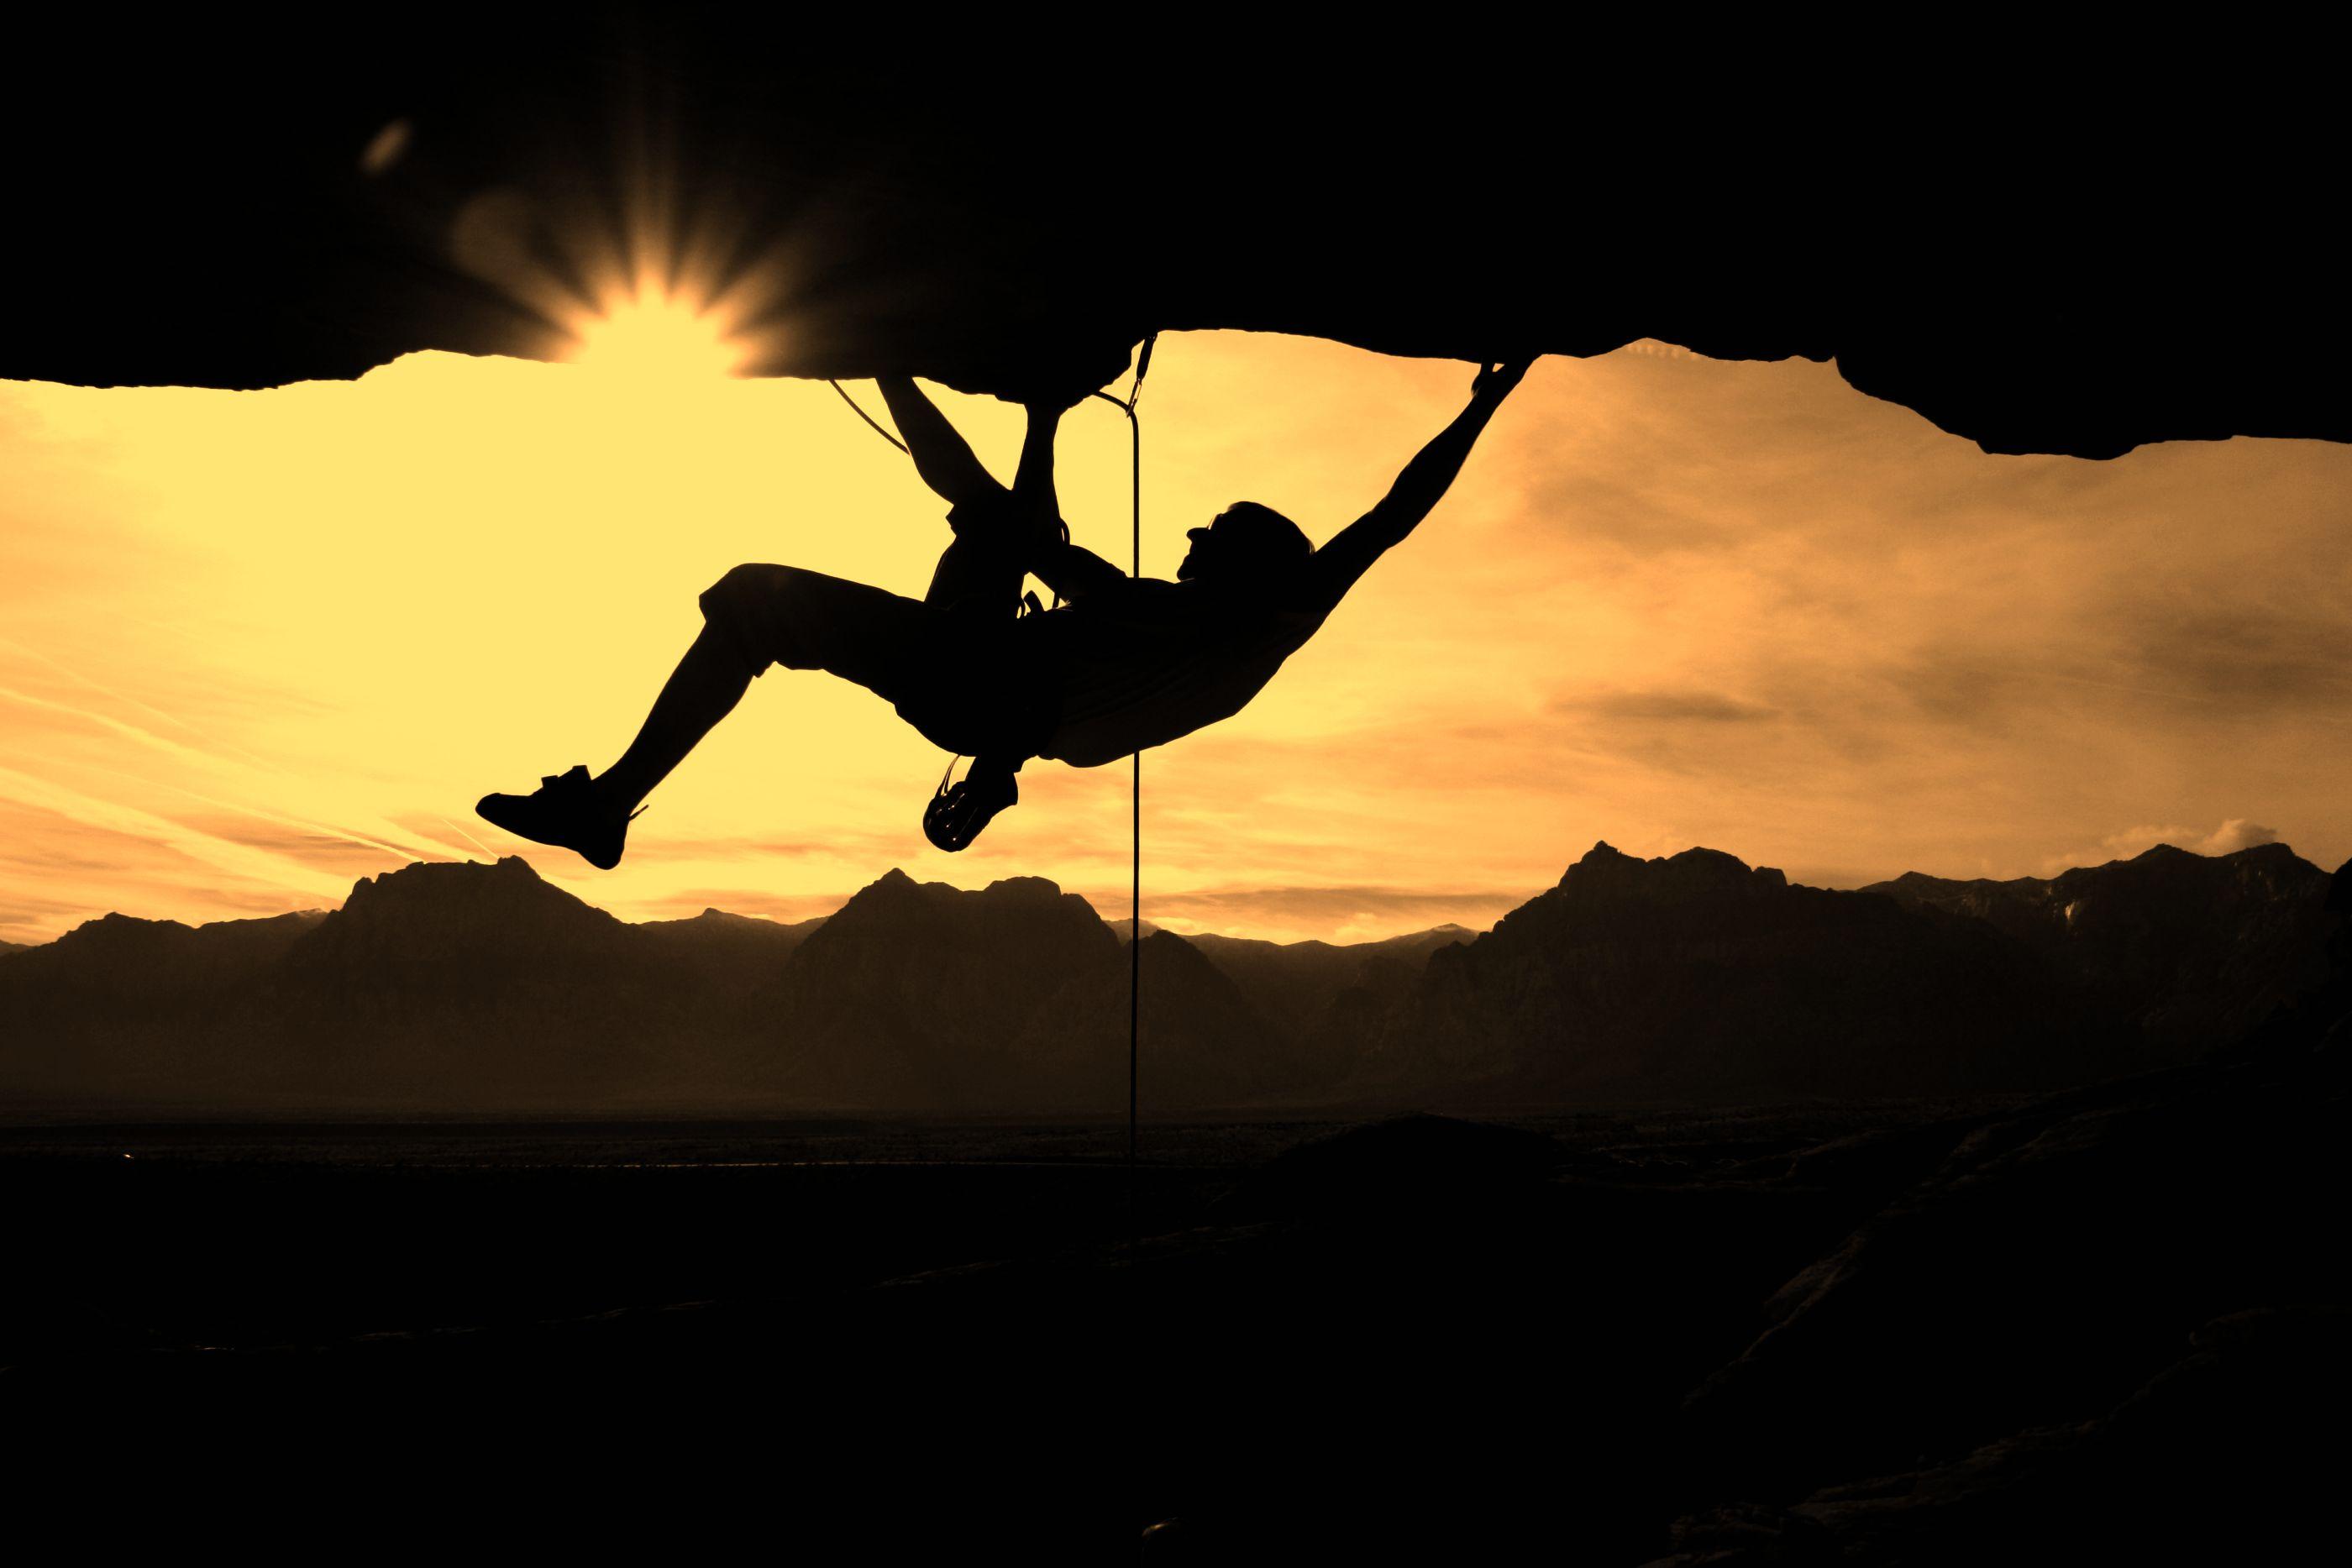 Rock climbing wallpapers high quality download free - Rock wallpaper ...